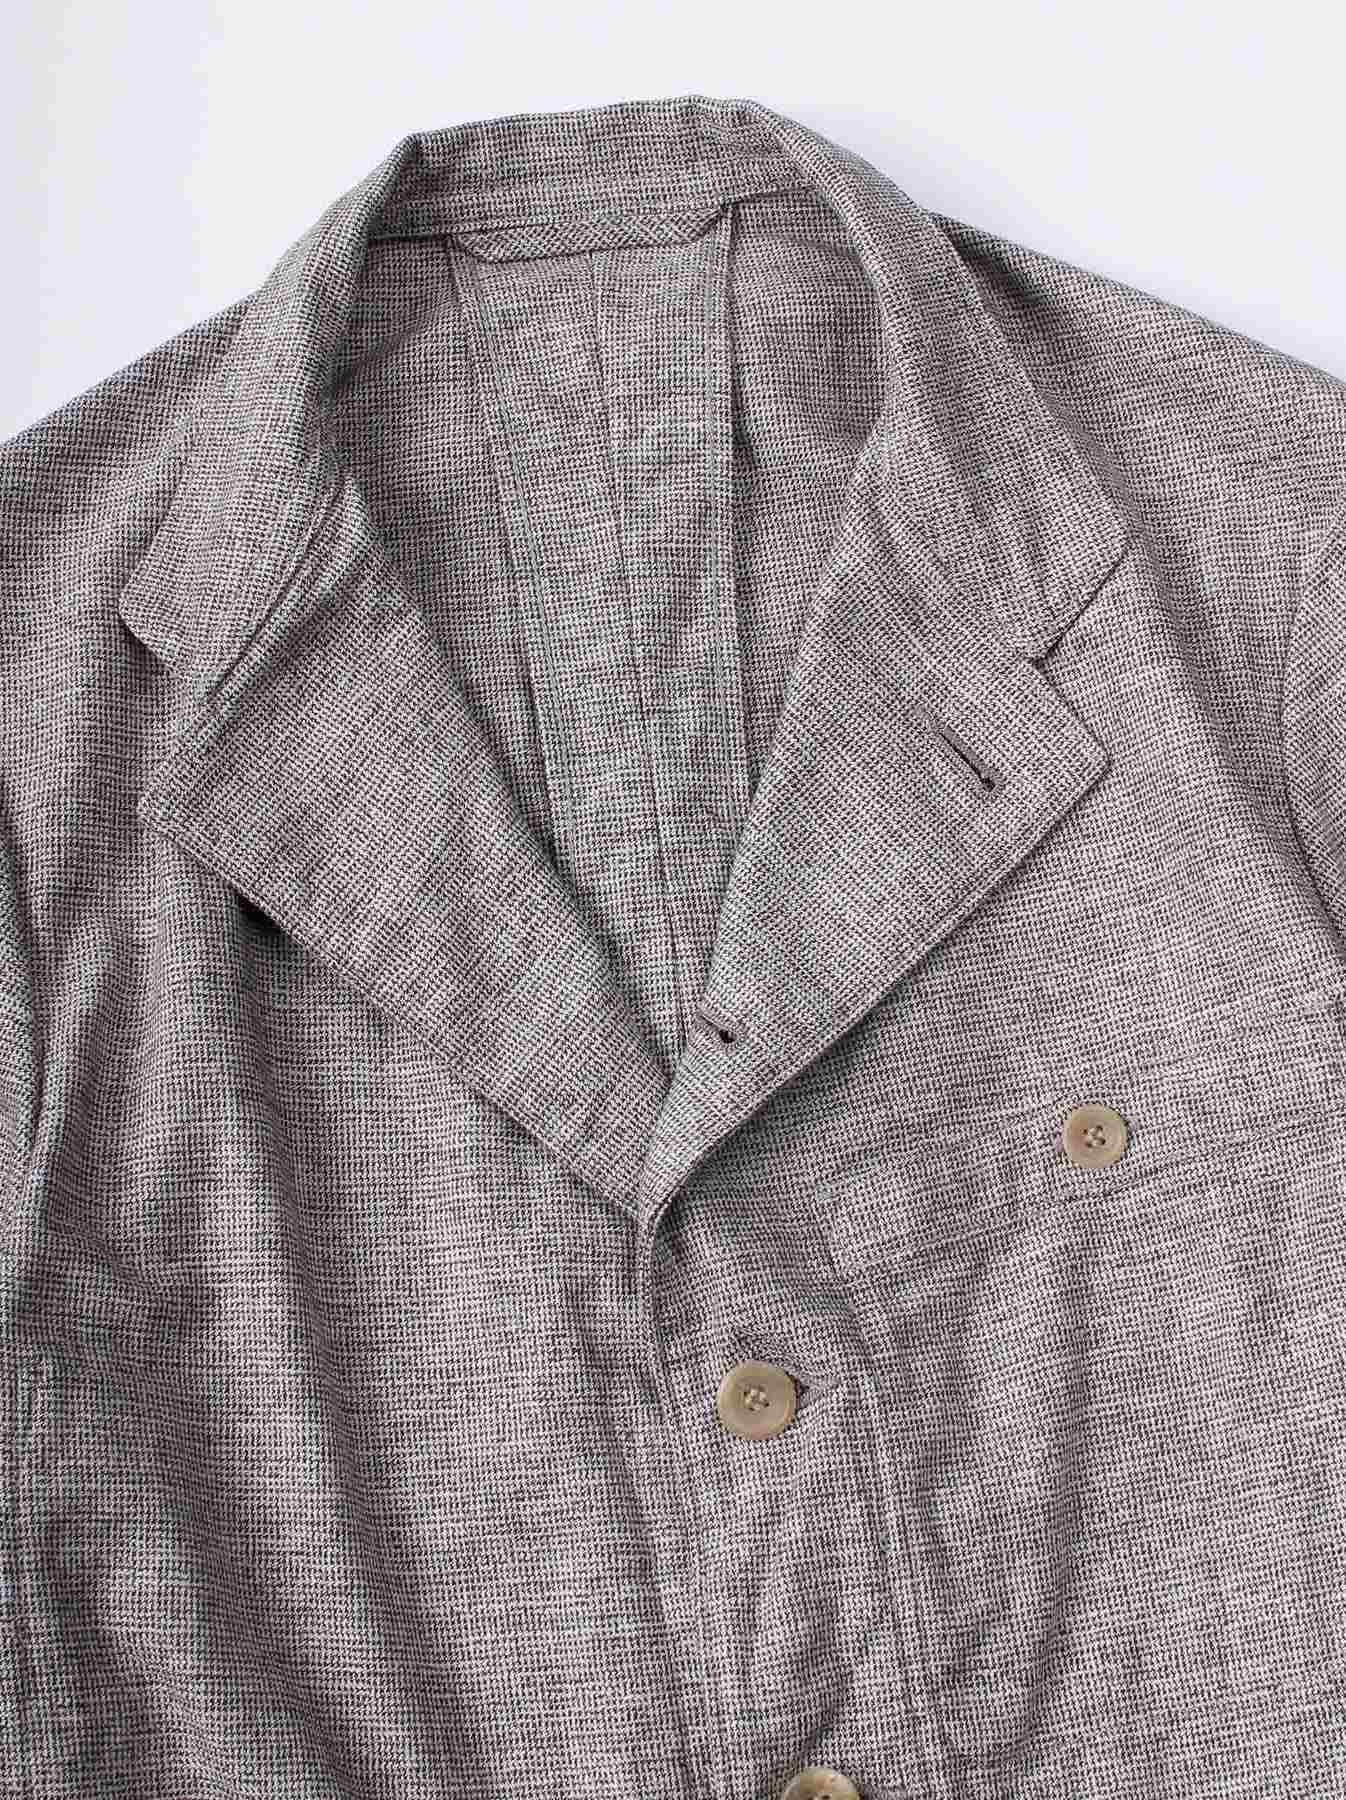 Cotton Tweed 908 Jacket-6